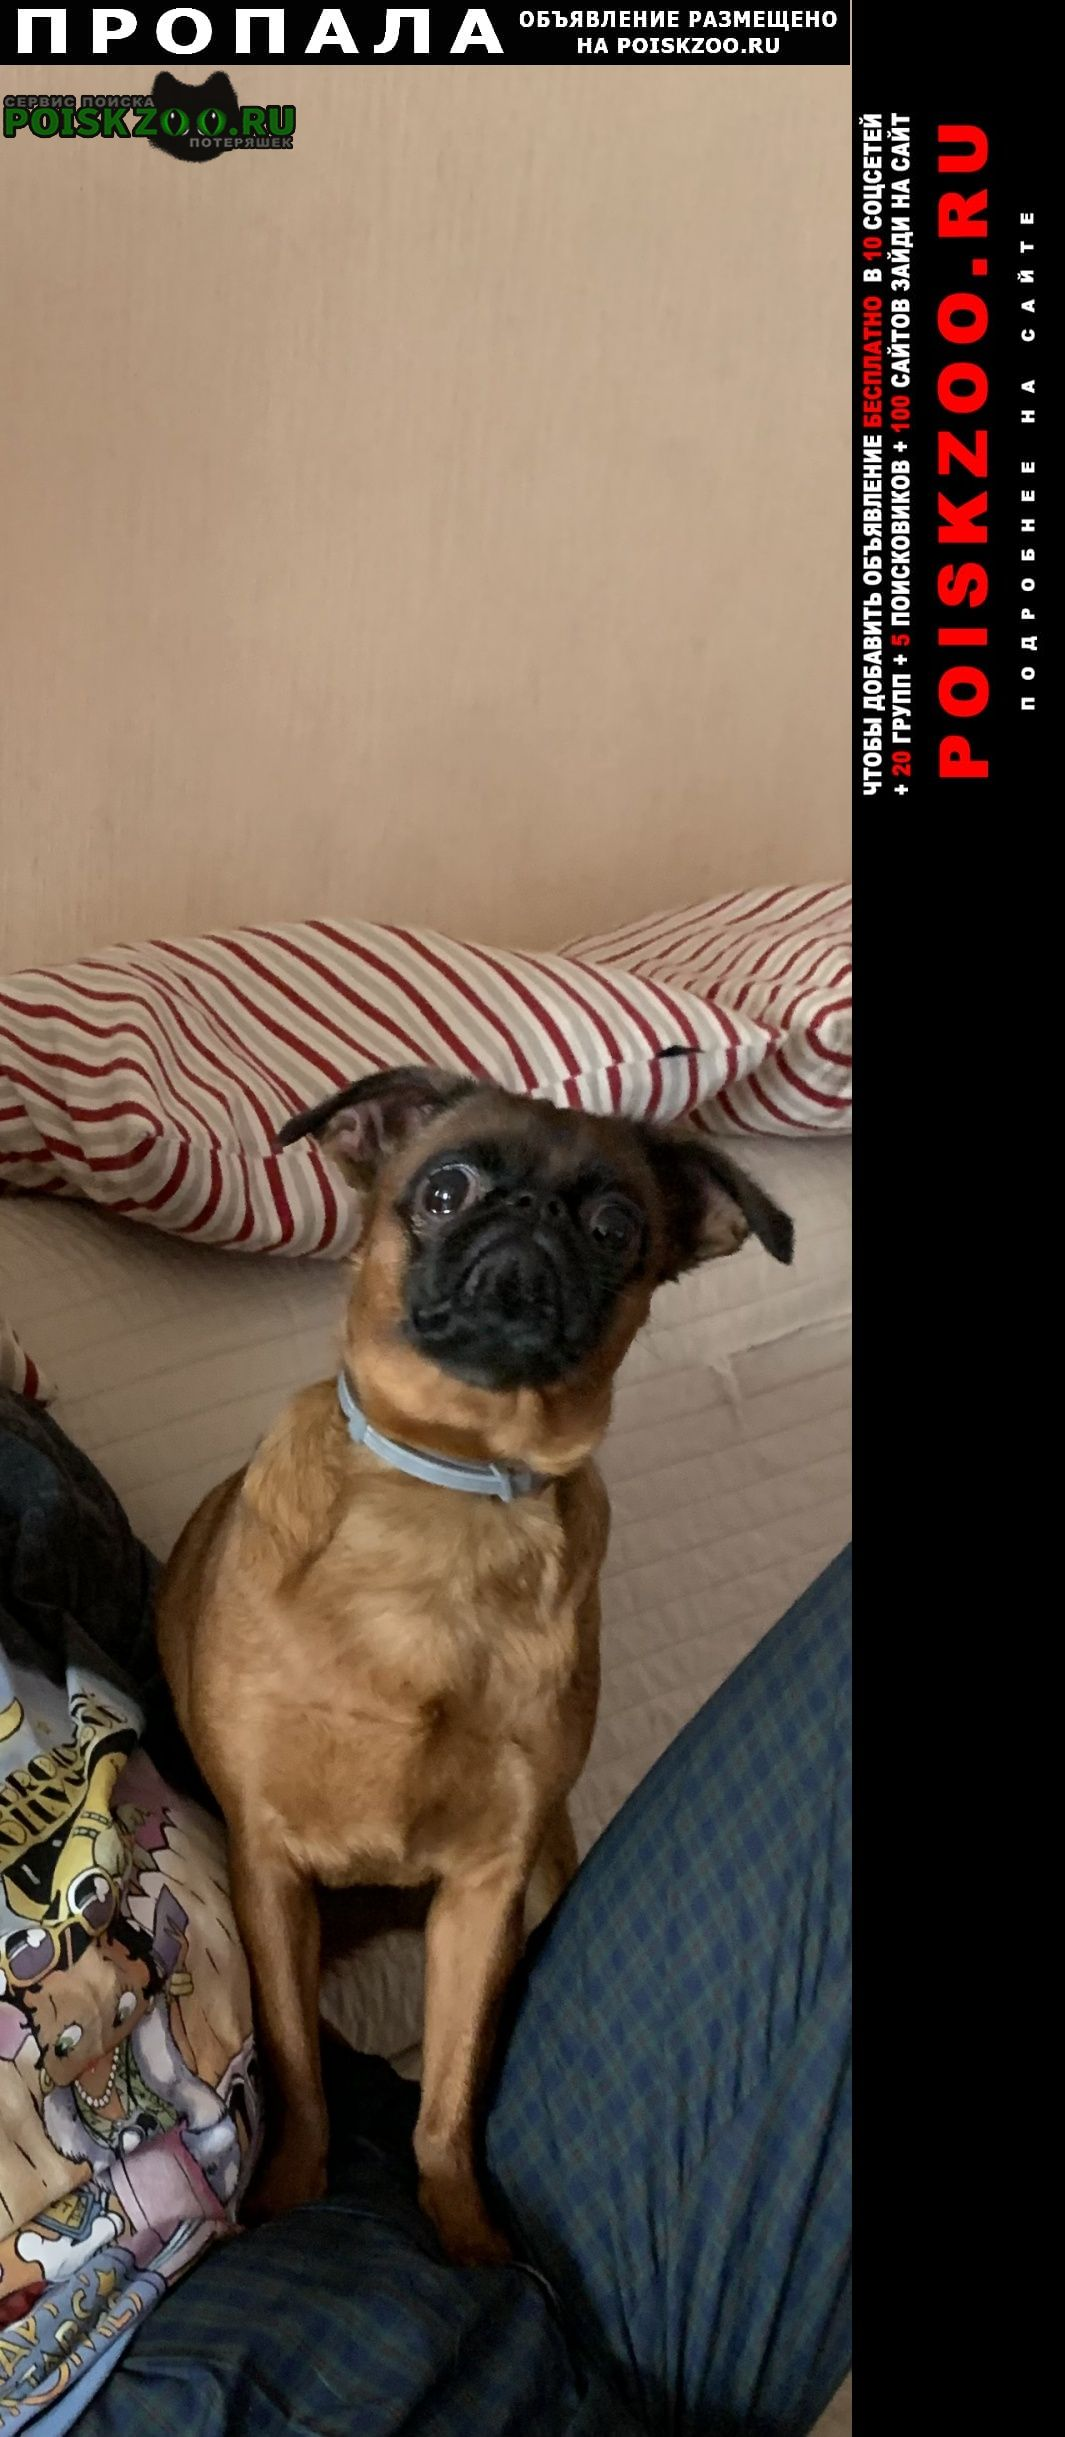 Пропала собака порода брабансон Москва